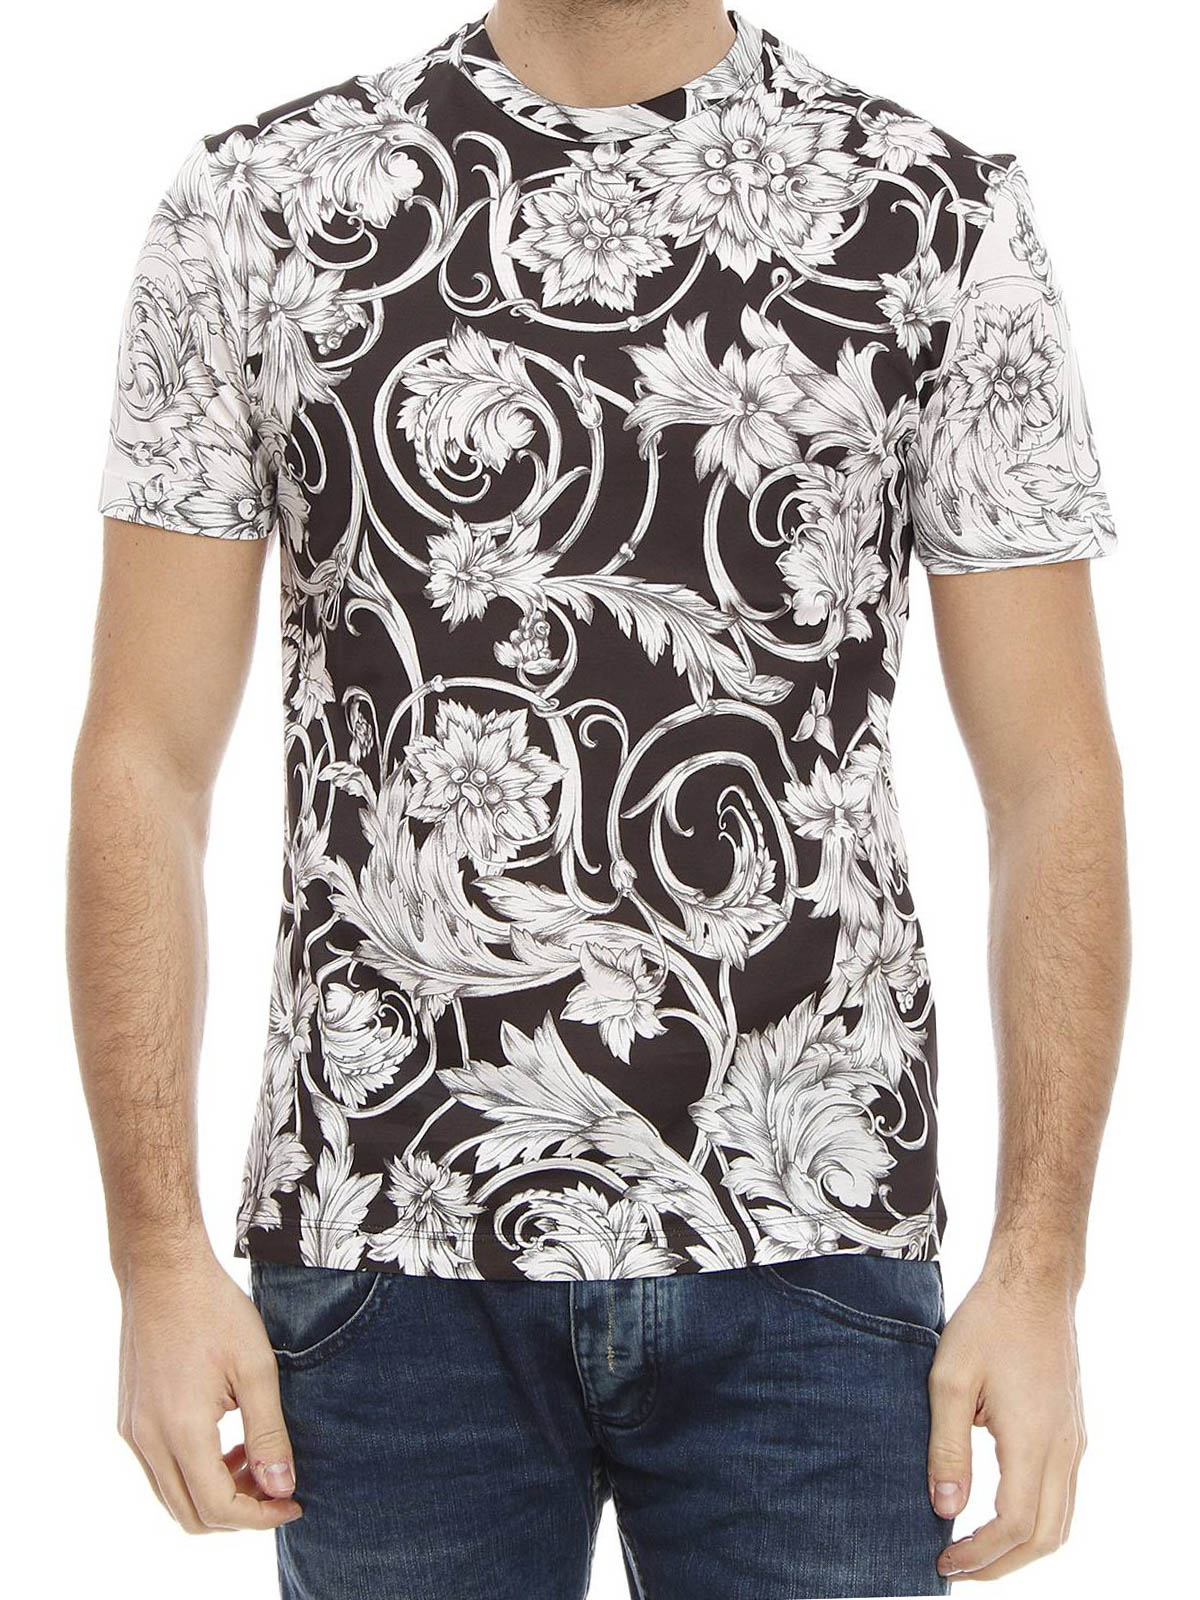 Baroque print T-shirt by Versace - t-shirts | iKRIX